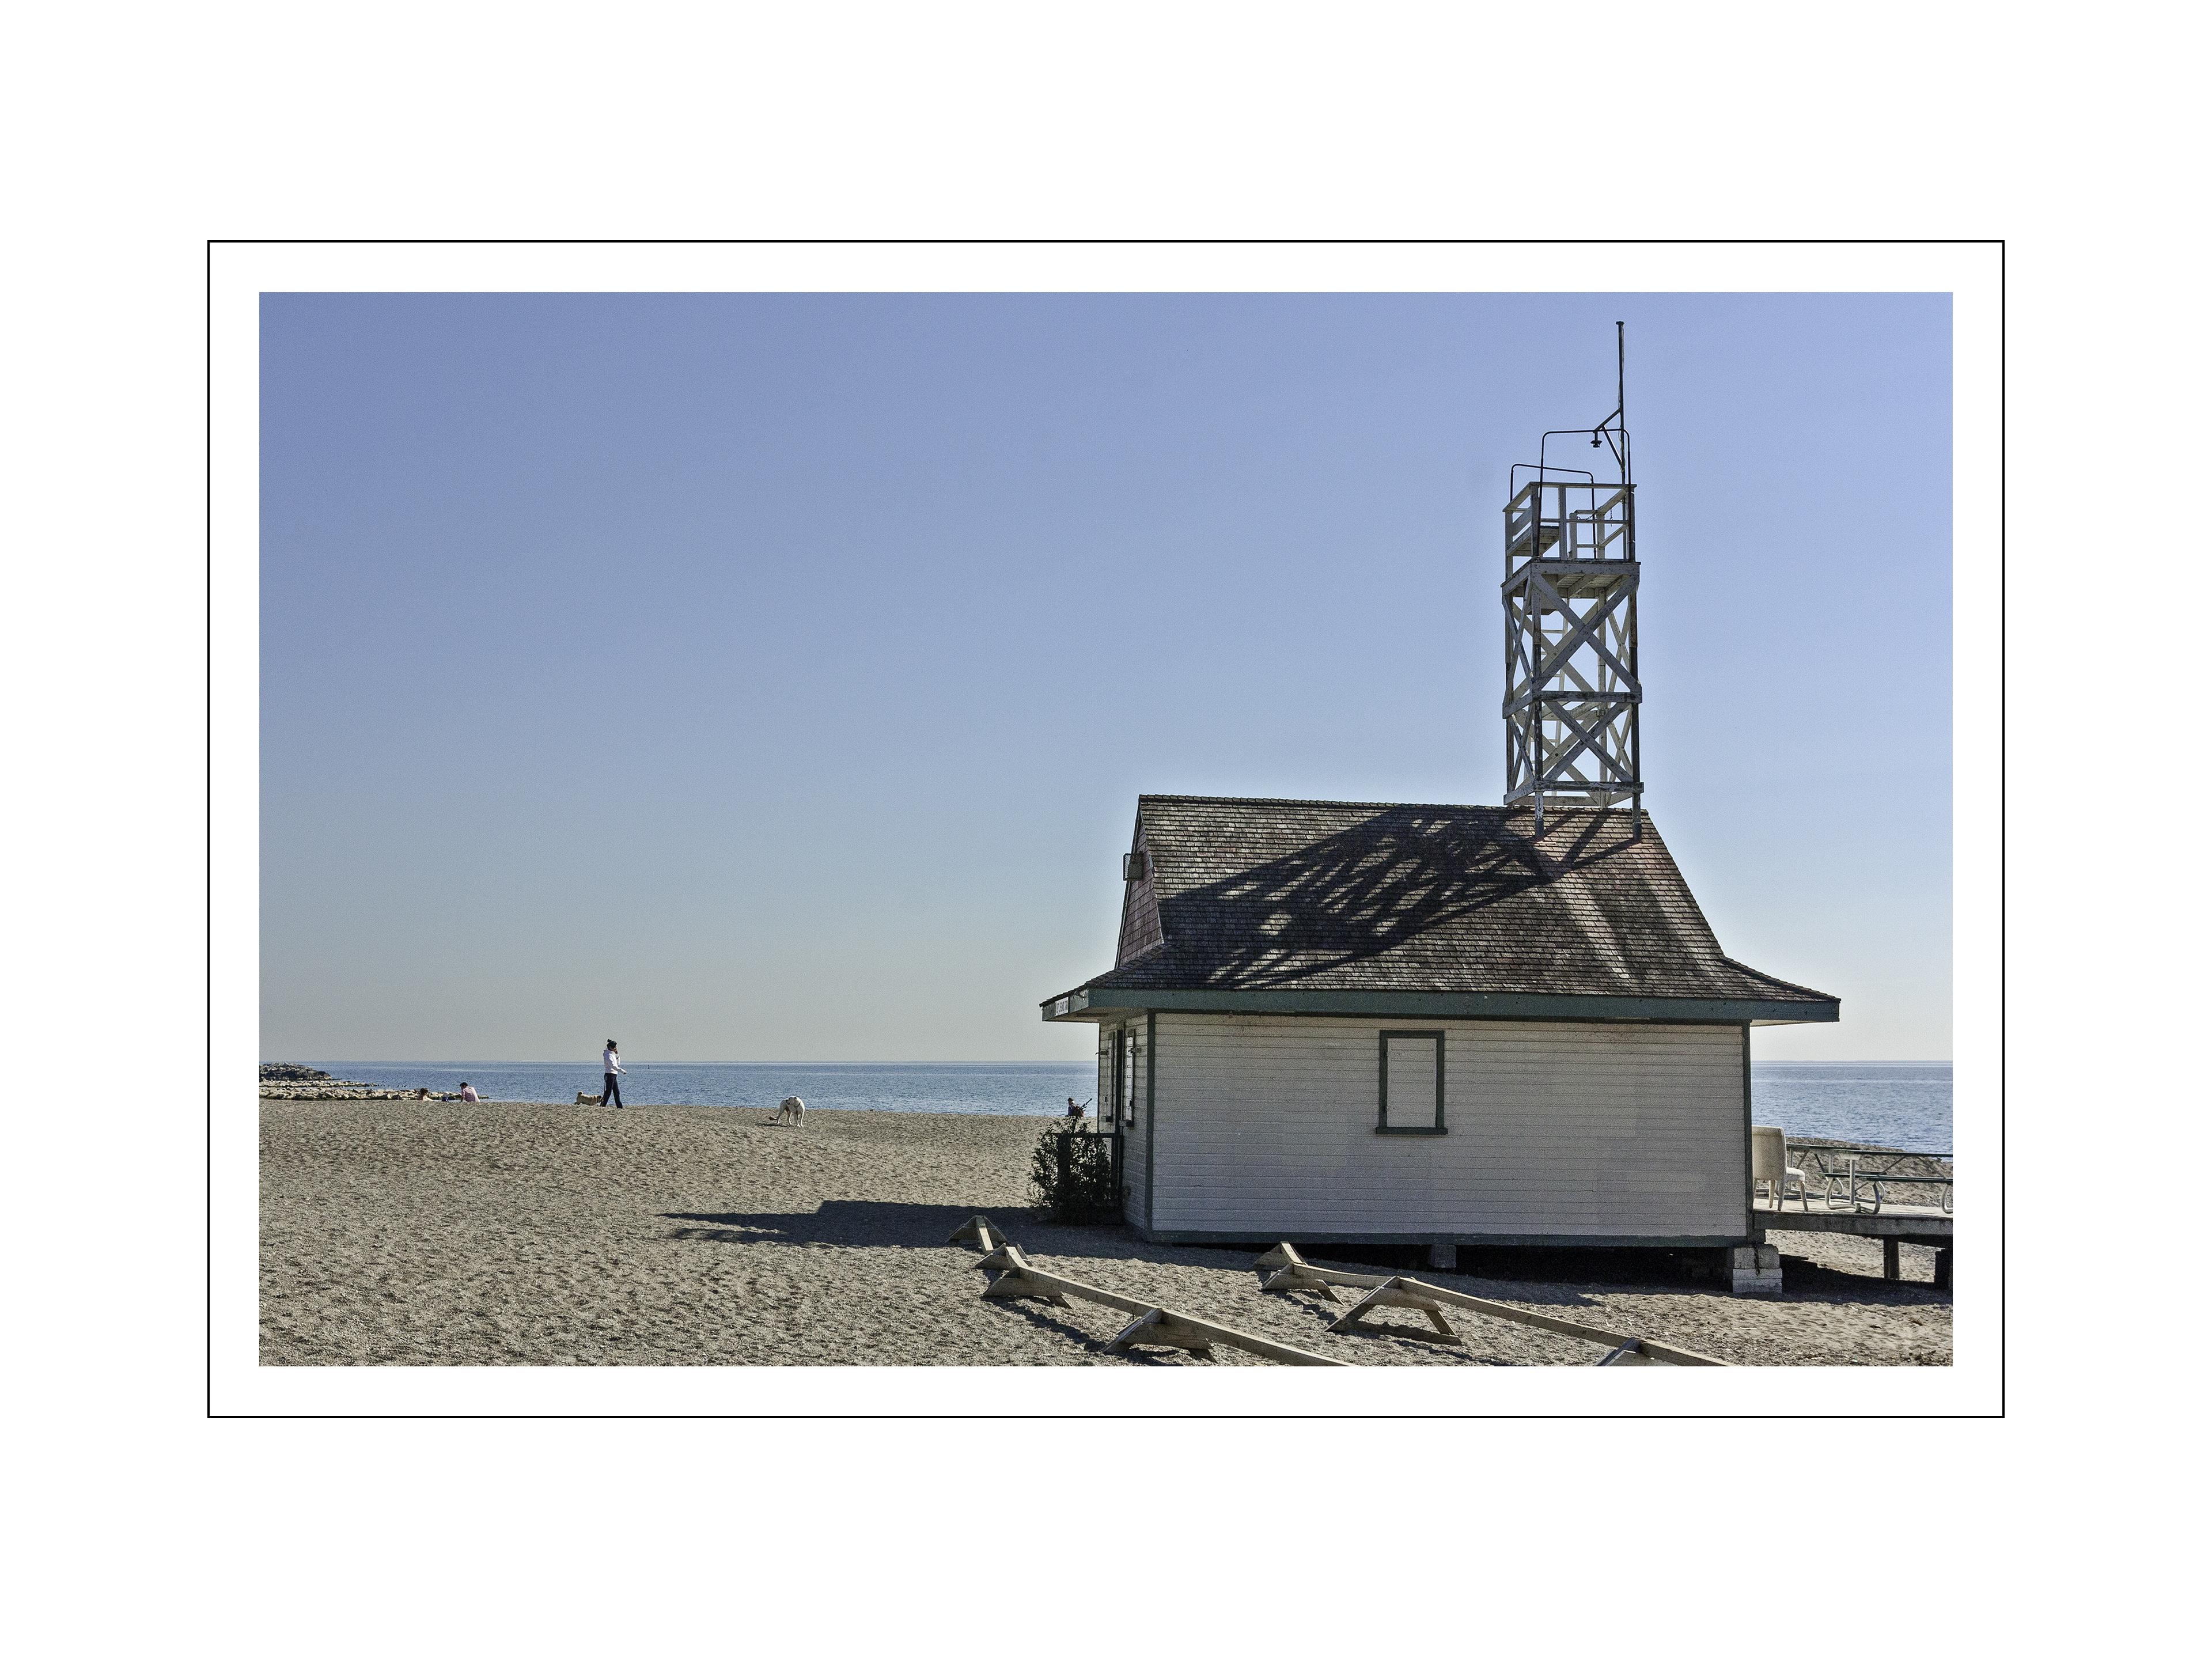 lifeguard-station-12x16